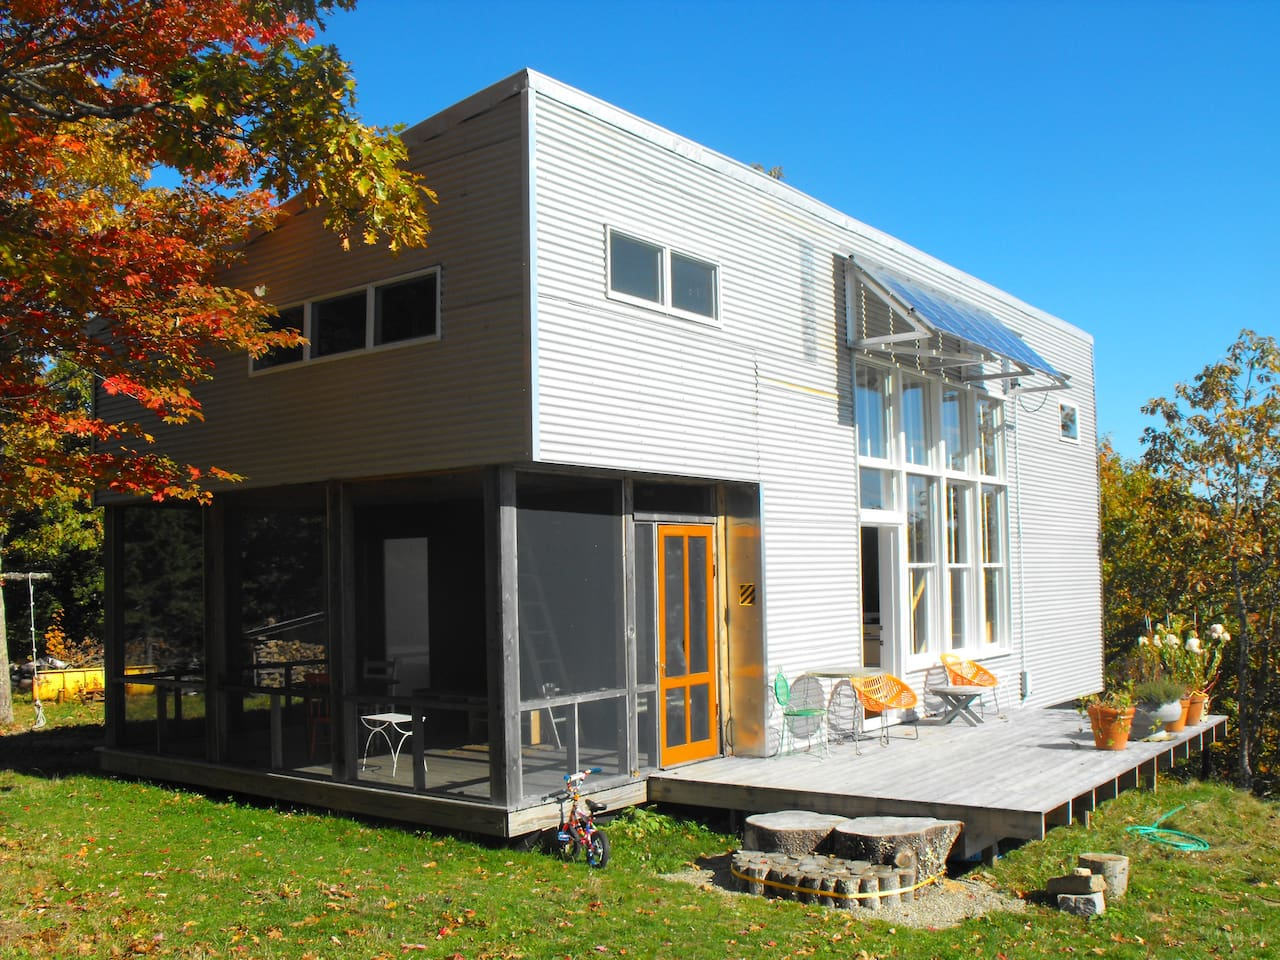 Facade, solar panels to power the camp